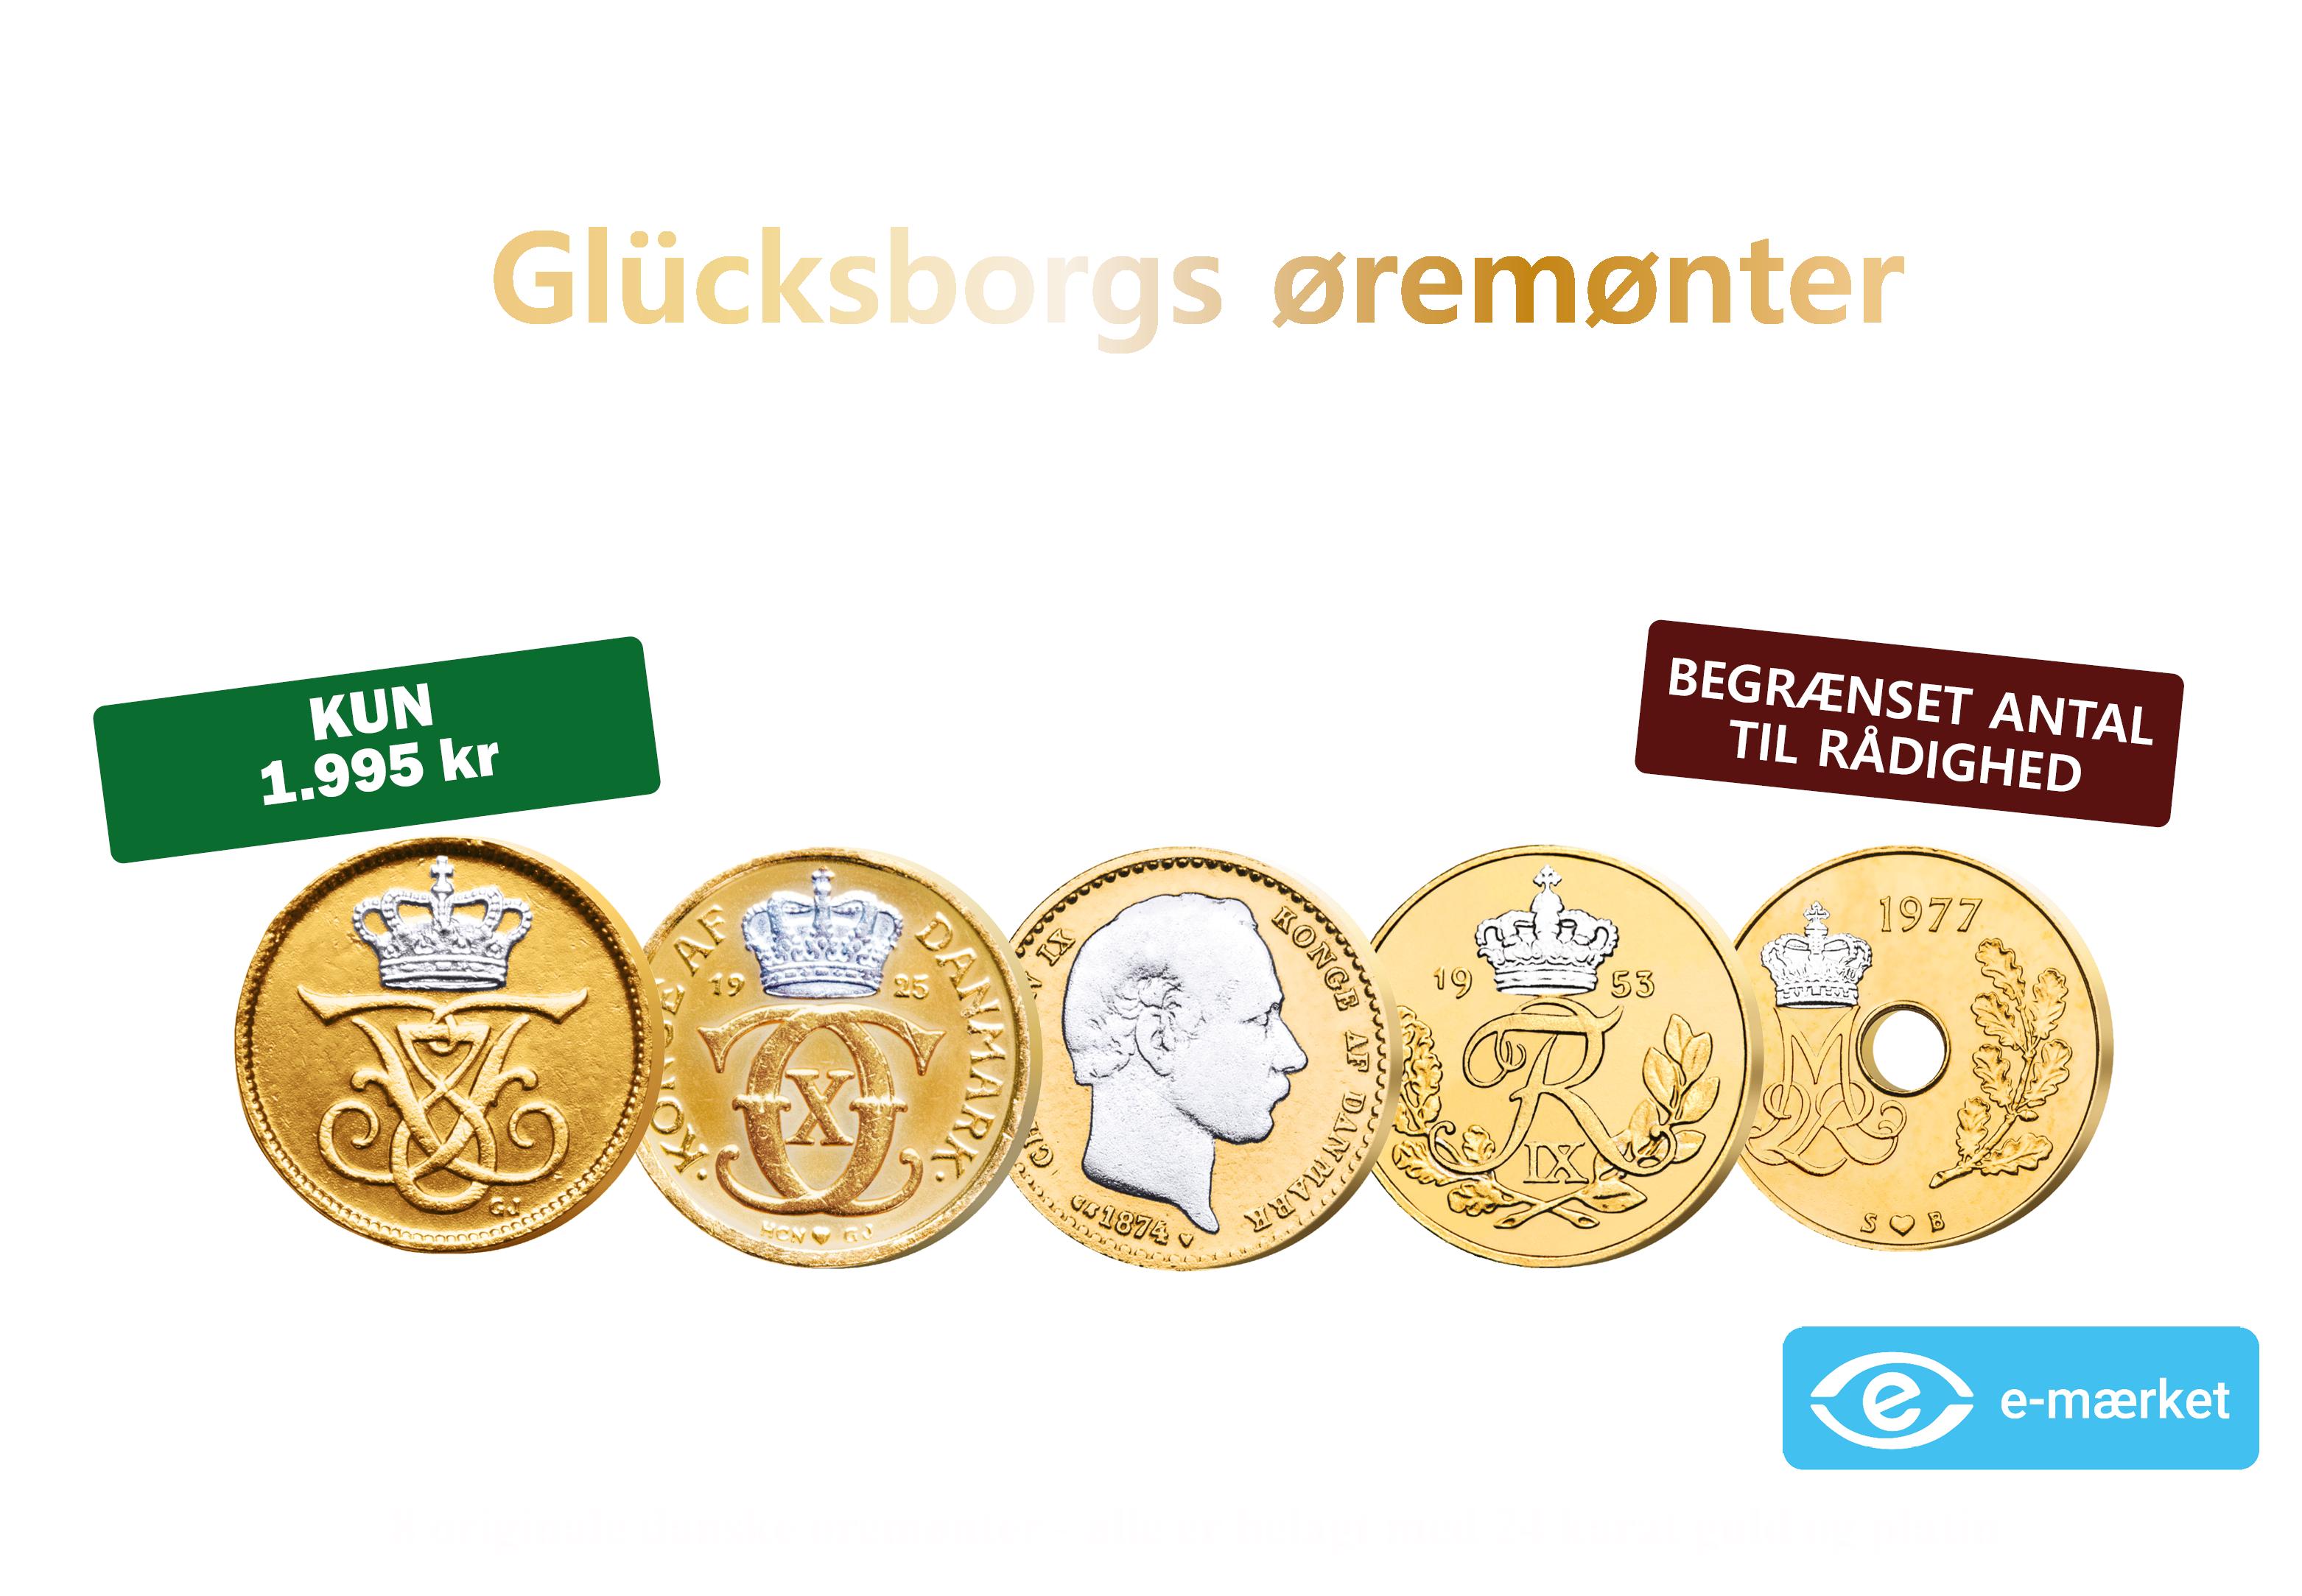 Glücksborgs øremønter - 8 øremønter fra Christian IX til Margrethe II